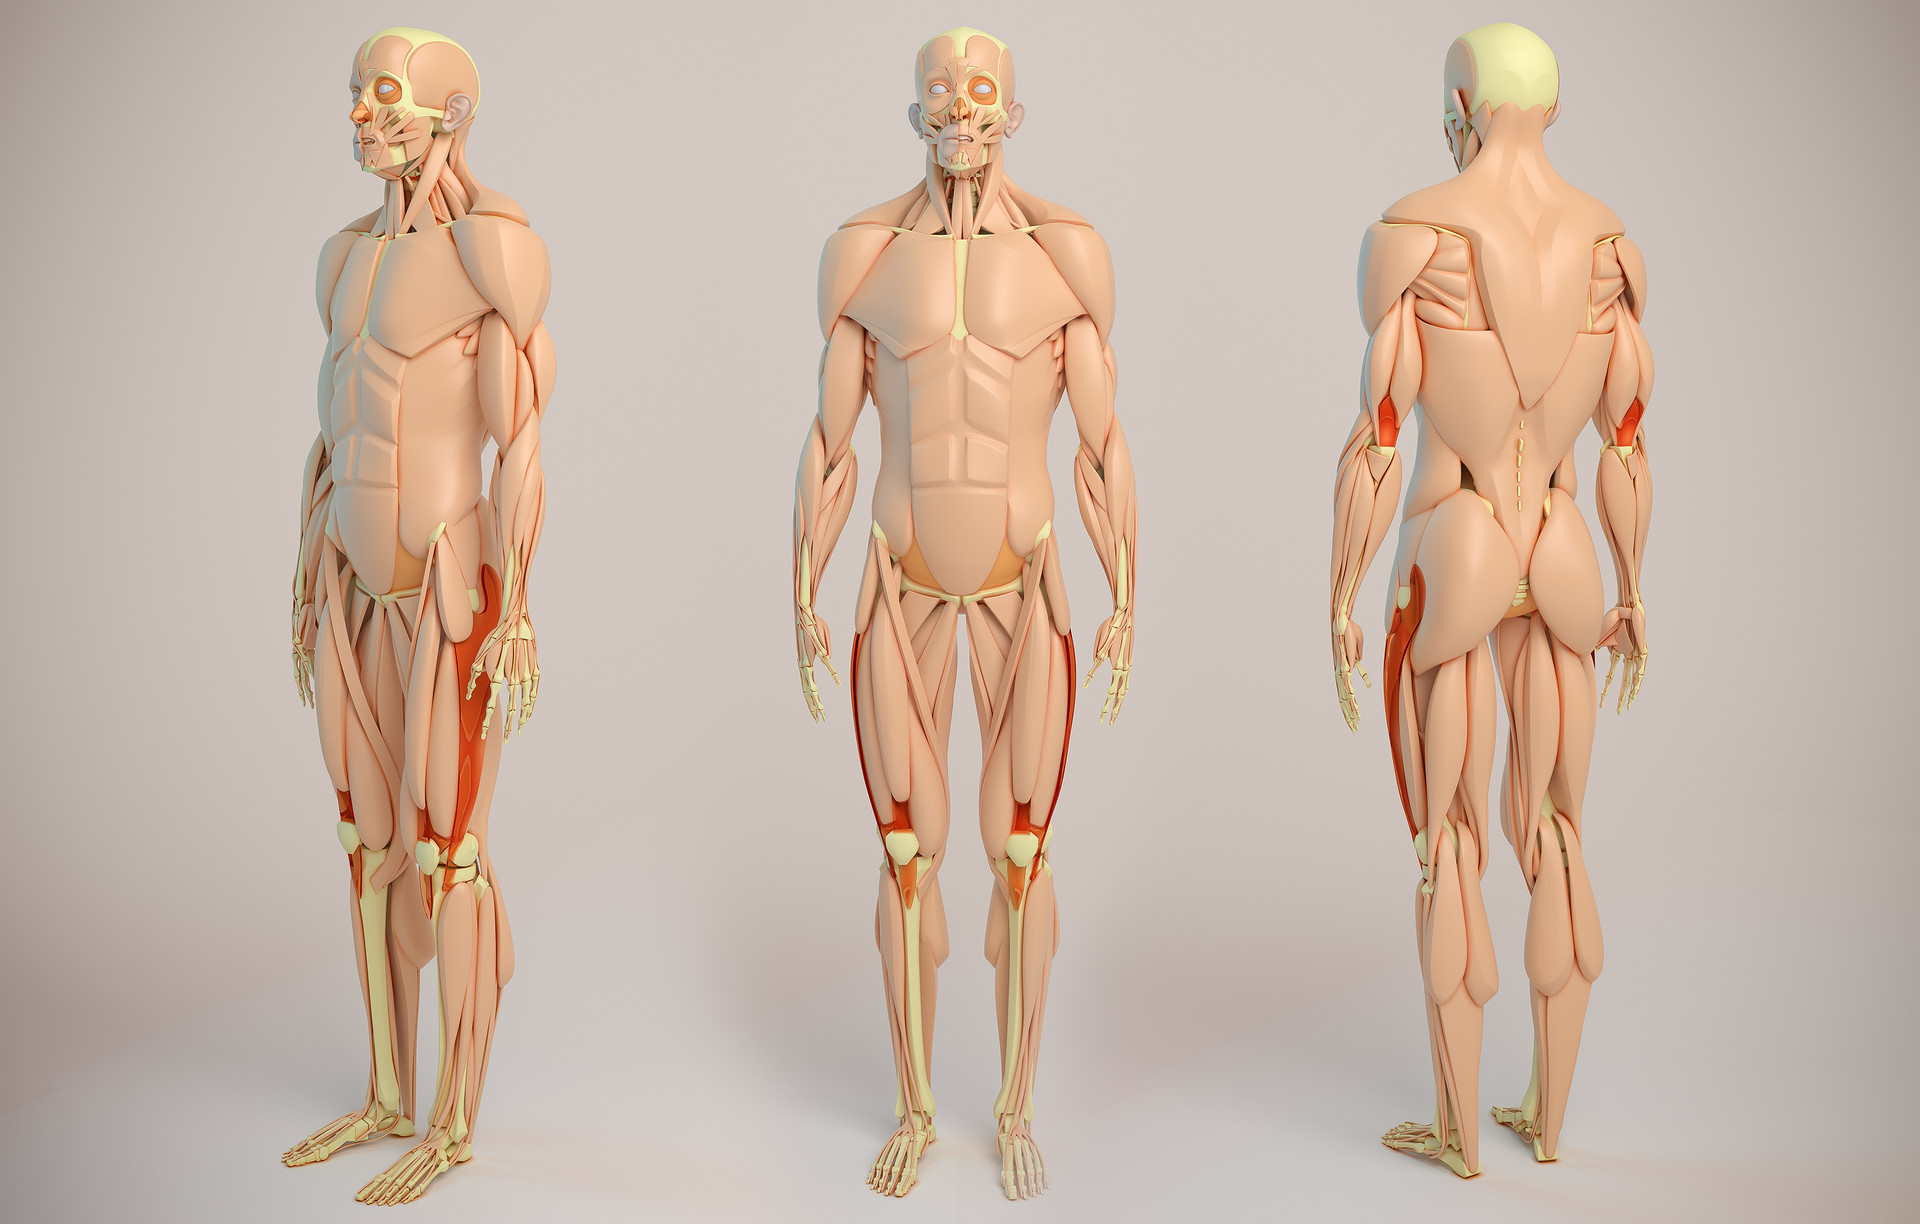 Aleksandrs k male anatomy jpg halfsize